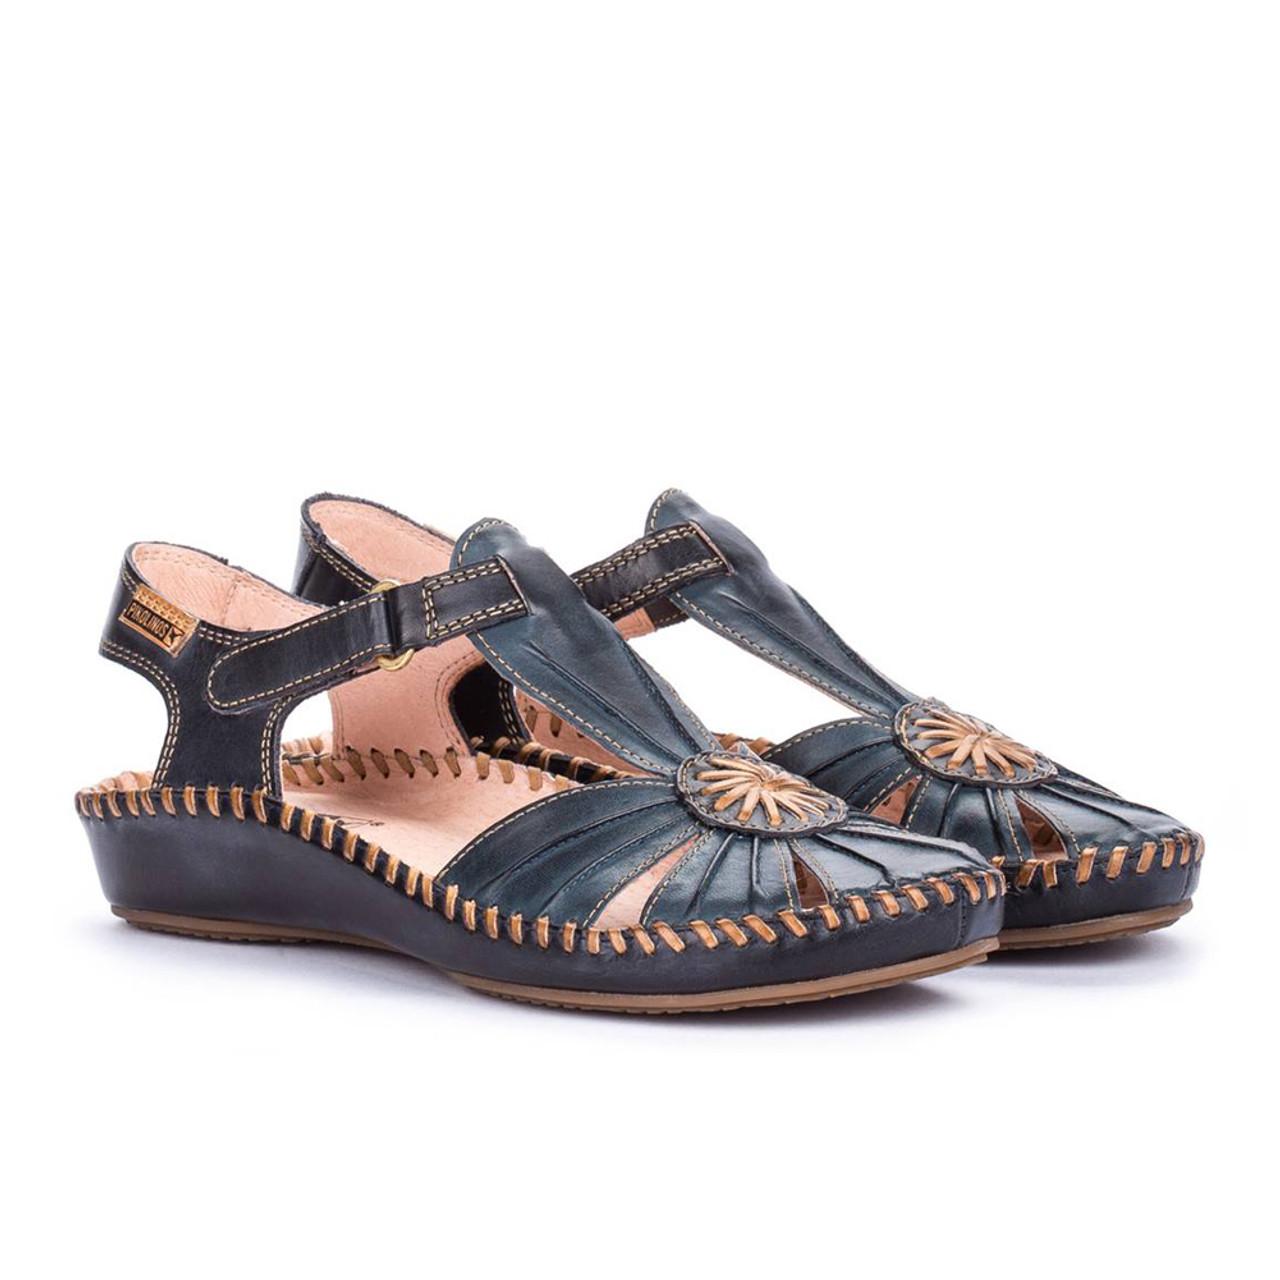 eafc30eb329 Pikolinos Women s P. Vallarta 655-8899C1 Sandal Ocean Navy Blue - Shop now